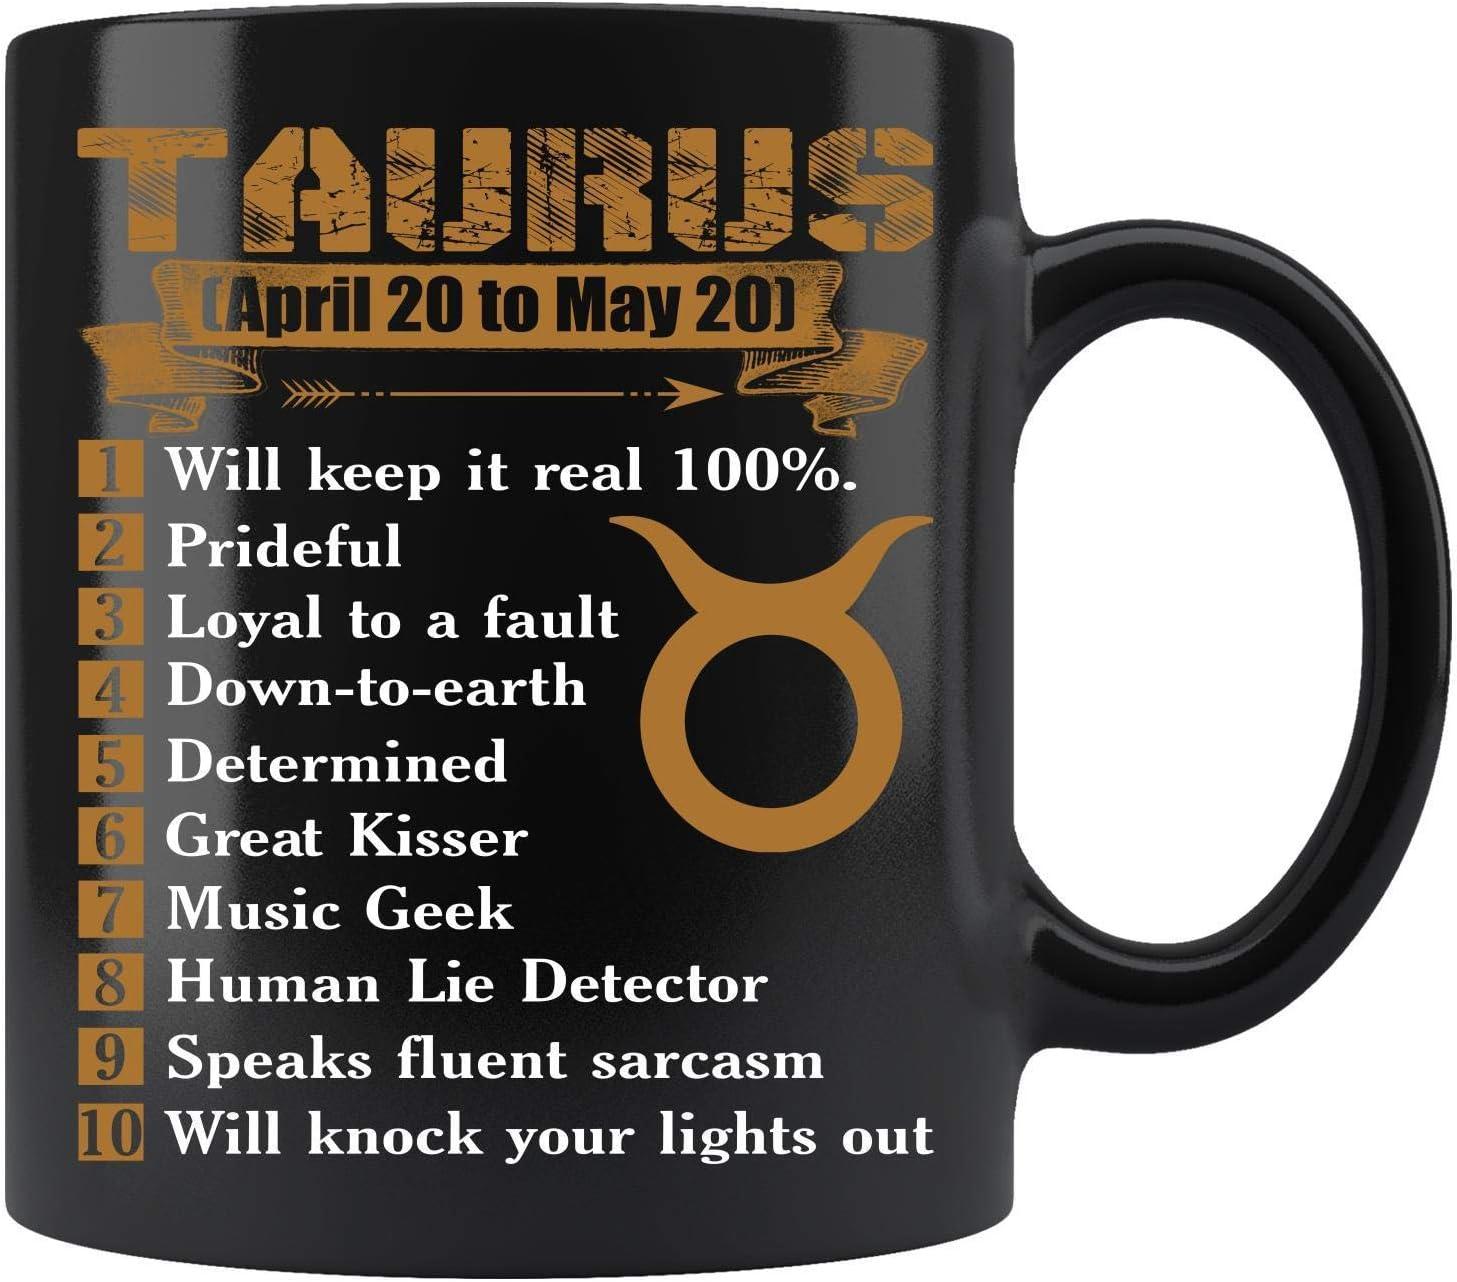 Taurus Mug Taurus Coffee Mug Funny Coffee Mug 11Oz Taurus Constellation Mug